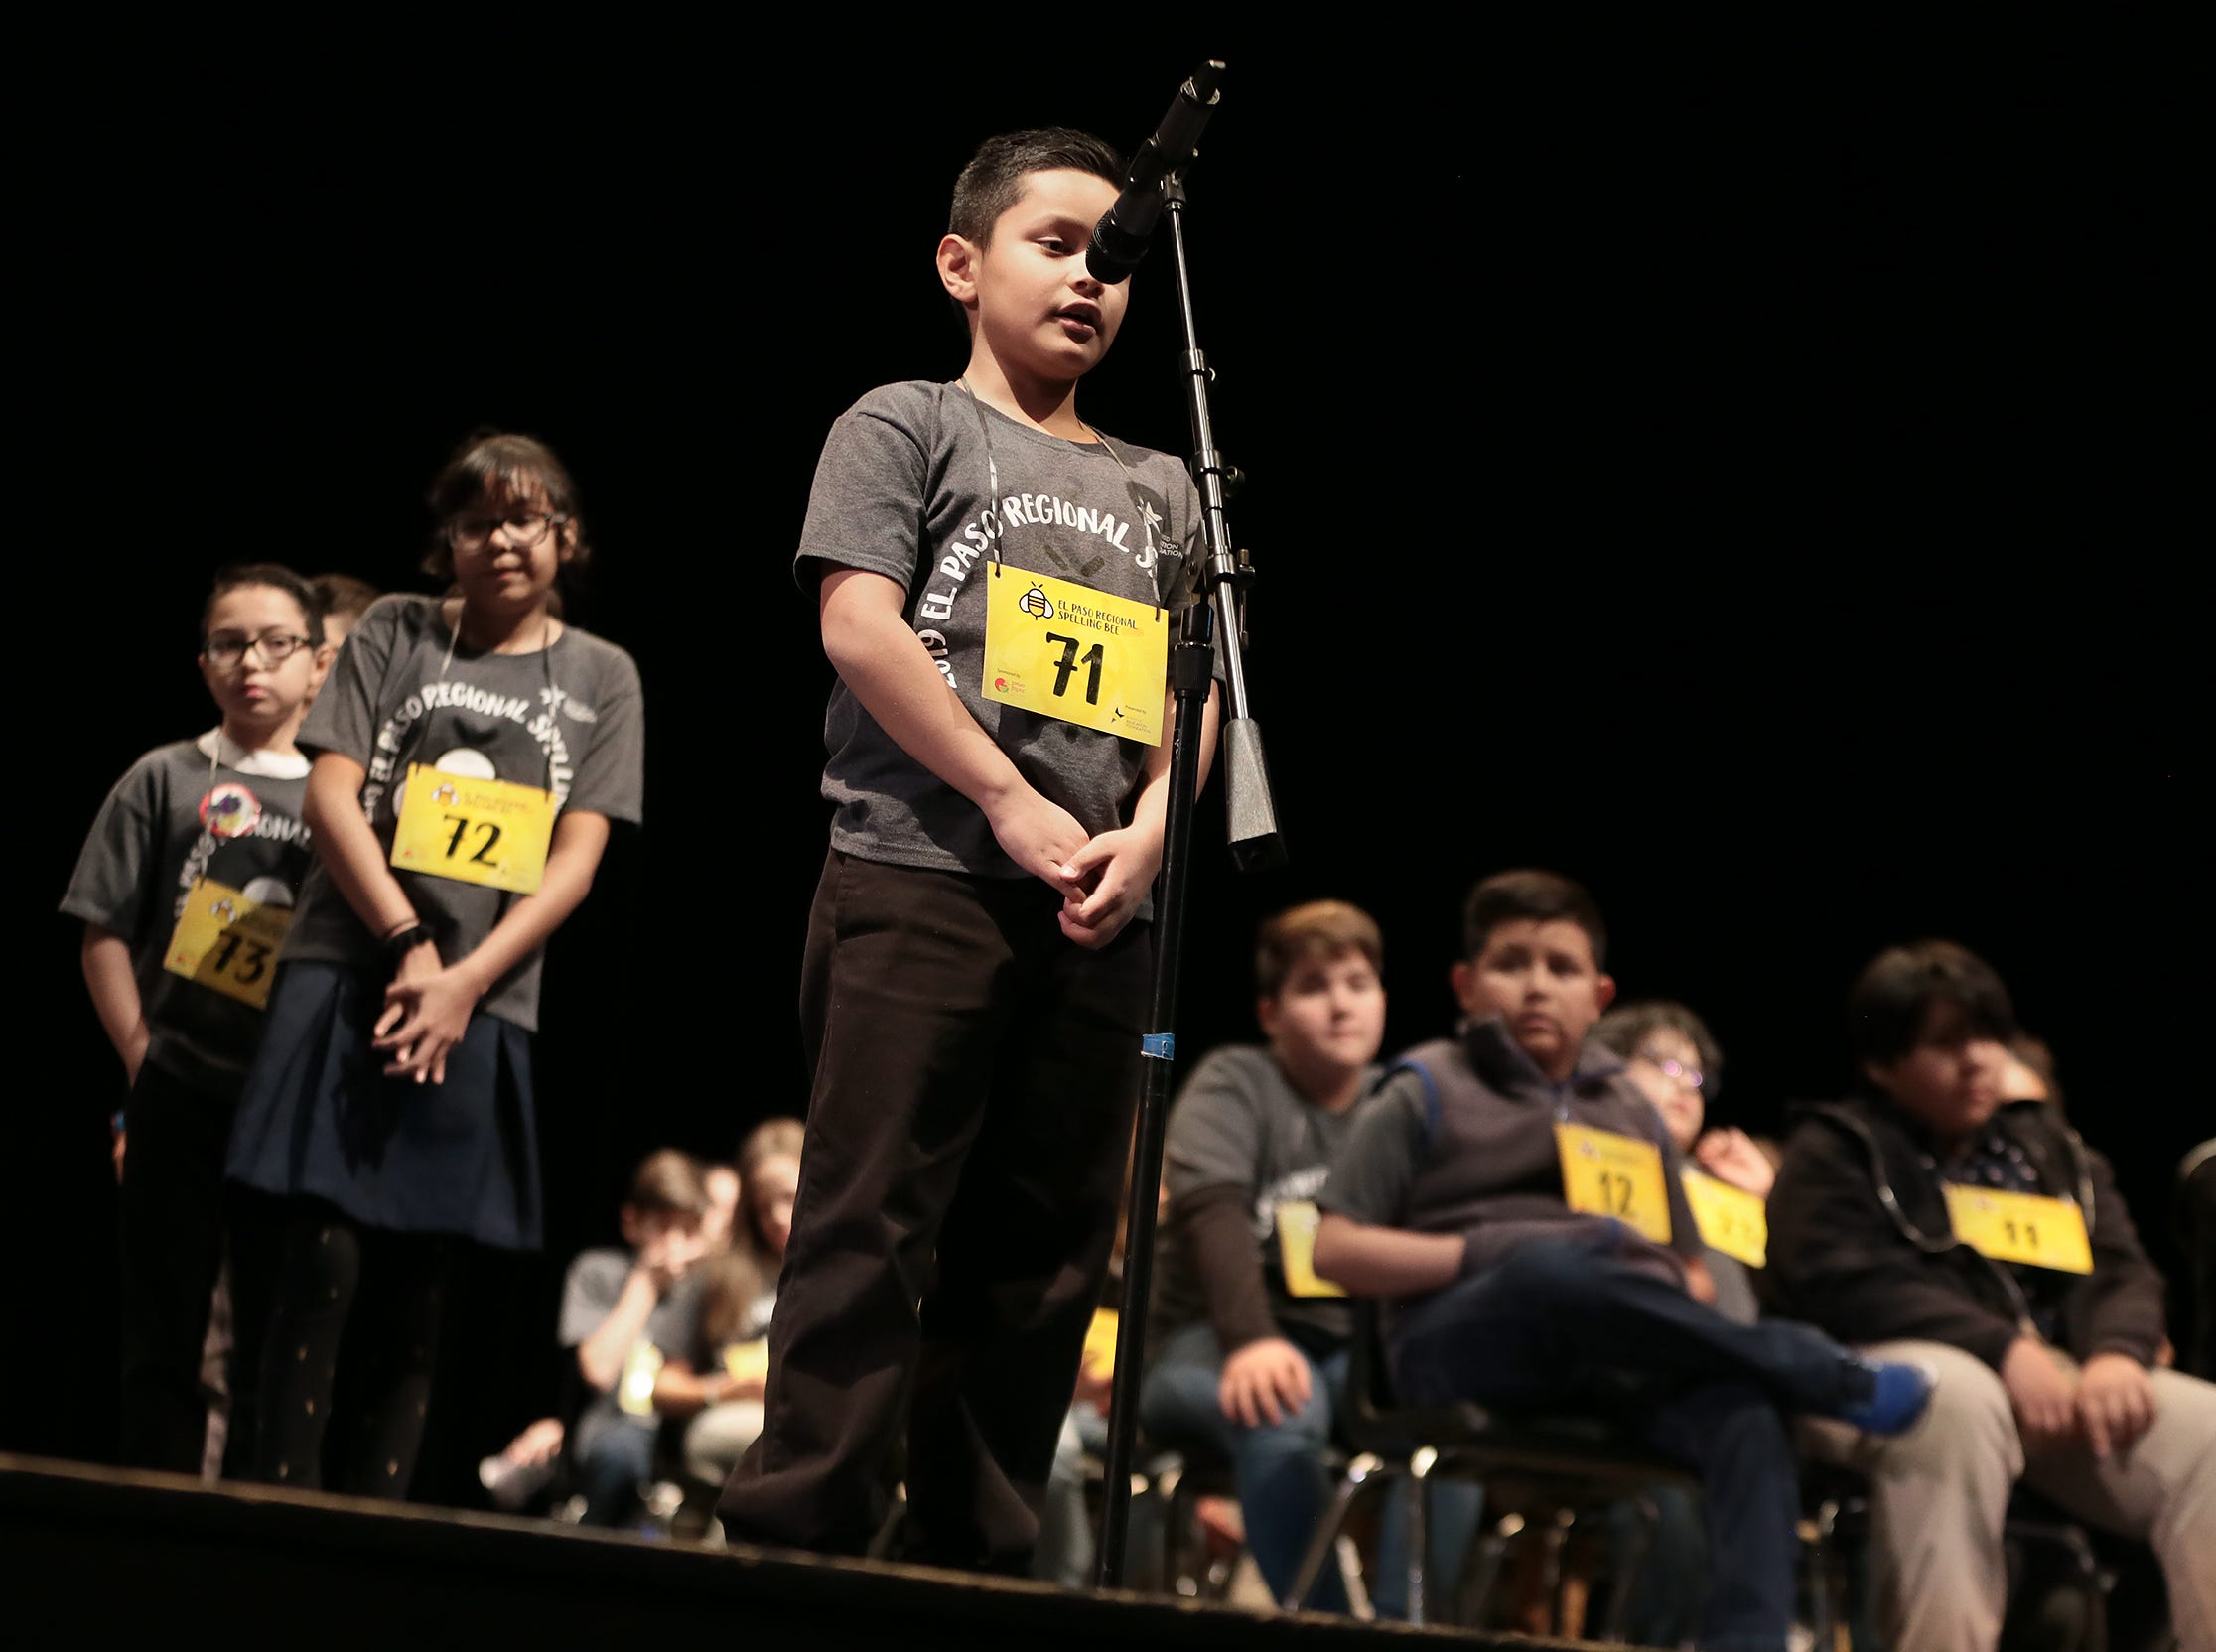 Josiah Navarro of Glen Cove Elementary School spells his word at the 2019 El Paso Regional Spelling Bee Friday at Bowie High School.